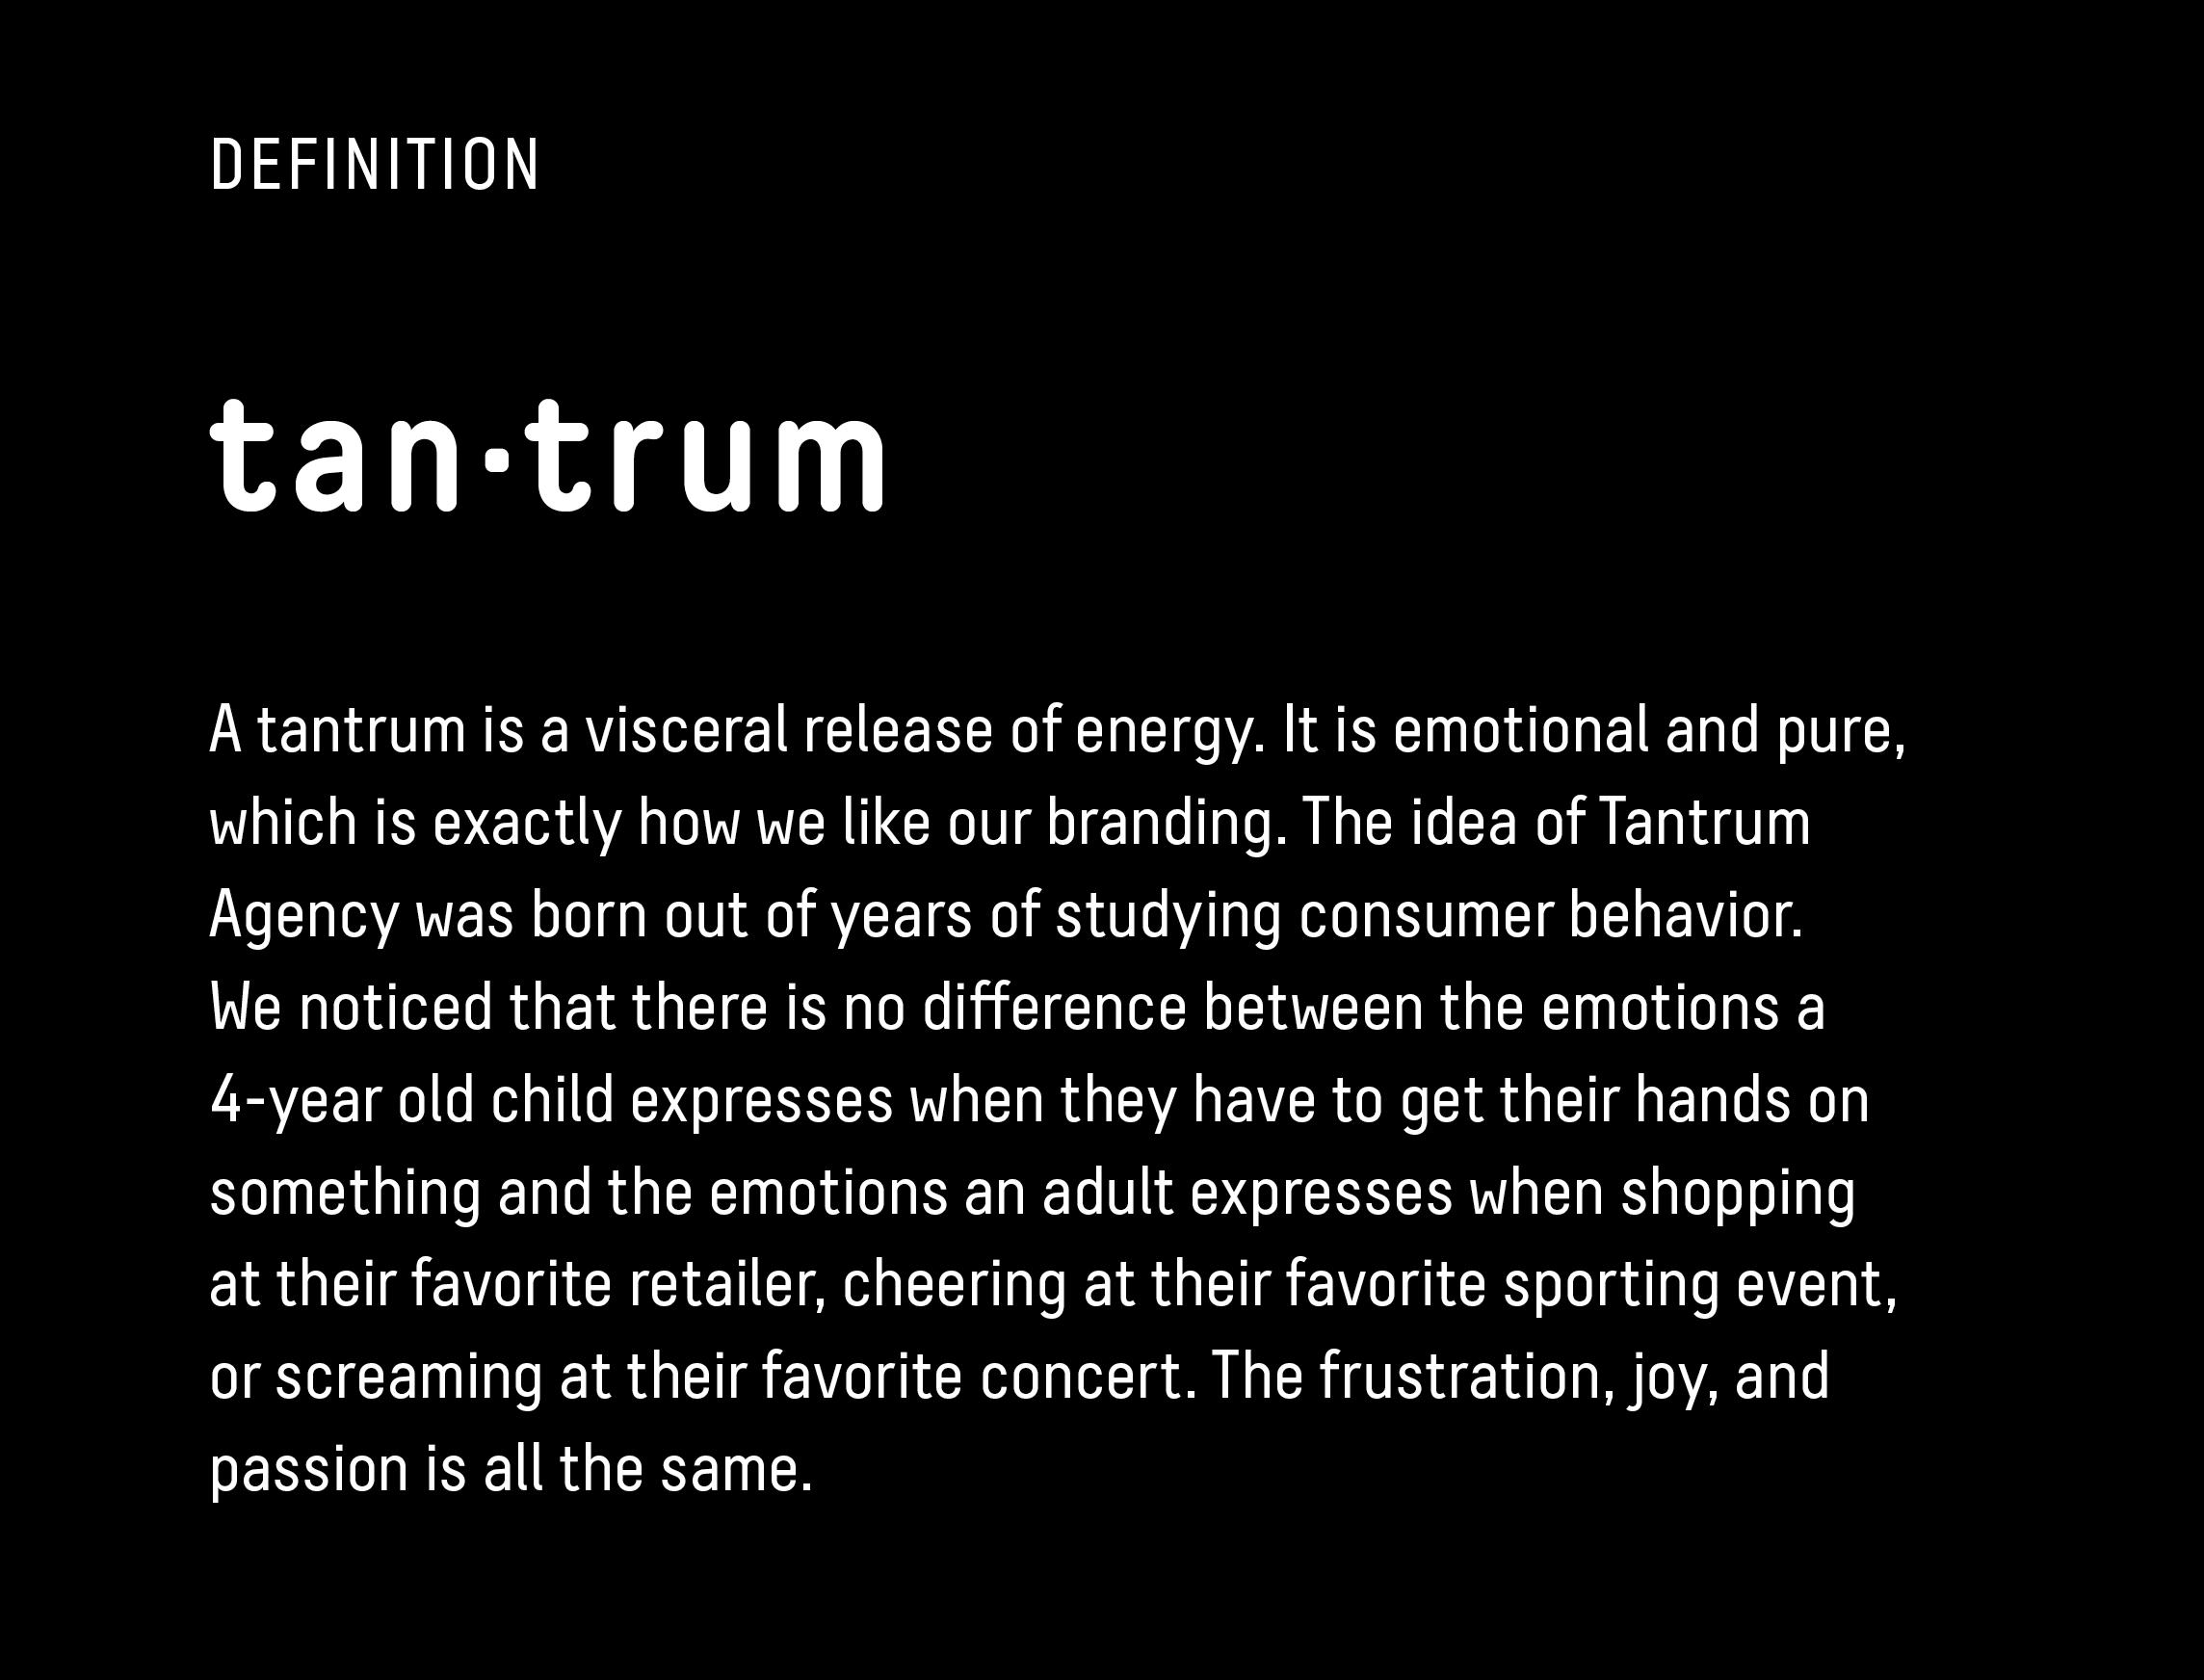 TANTRUM_definition_3.png